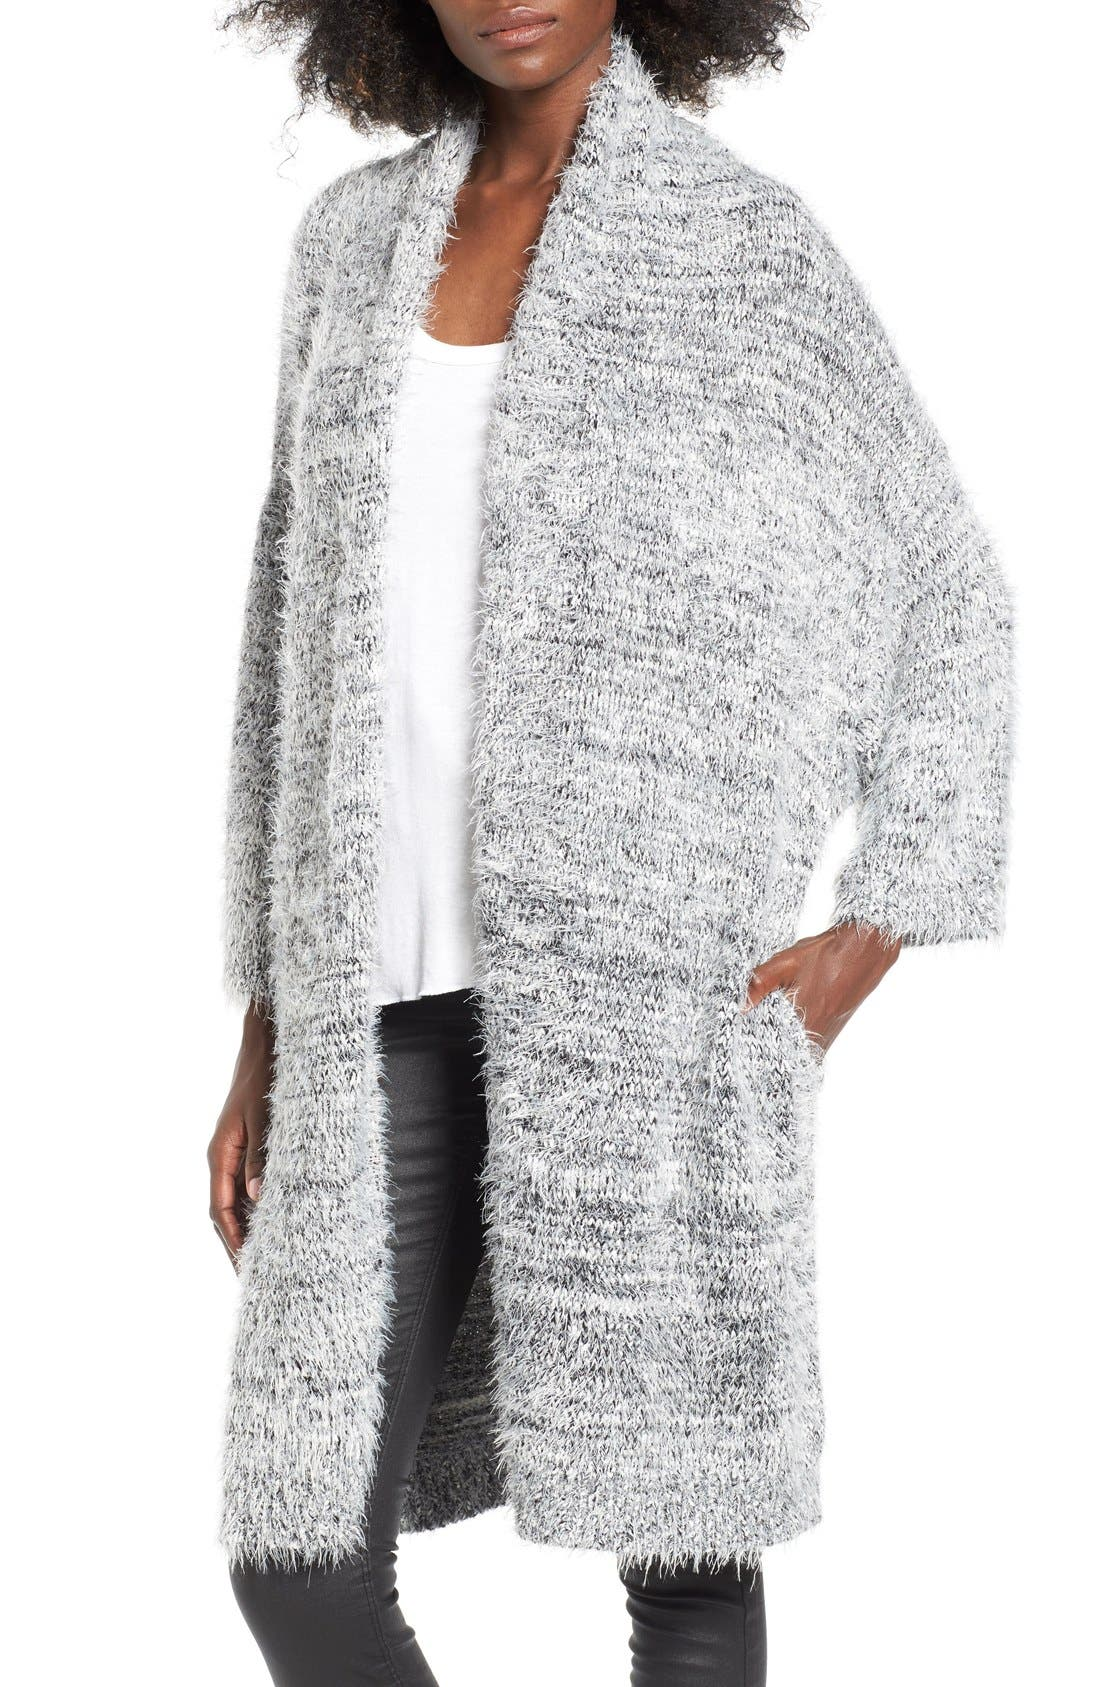 Alternate Image 1 Selected - Leith Fluffy Oversize Cardigan